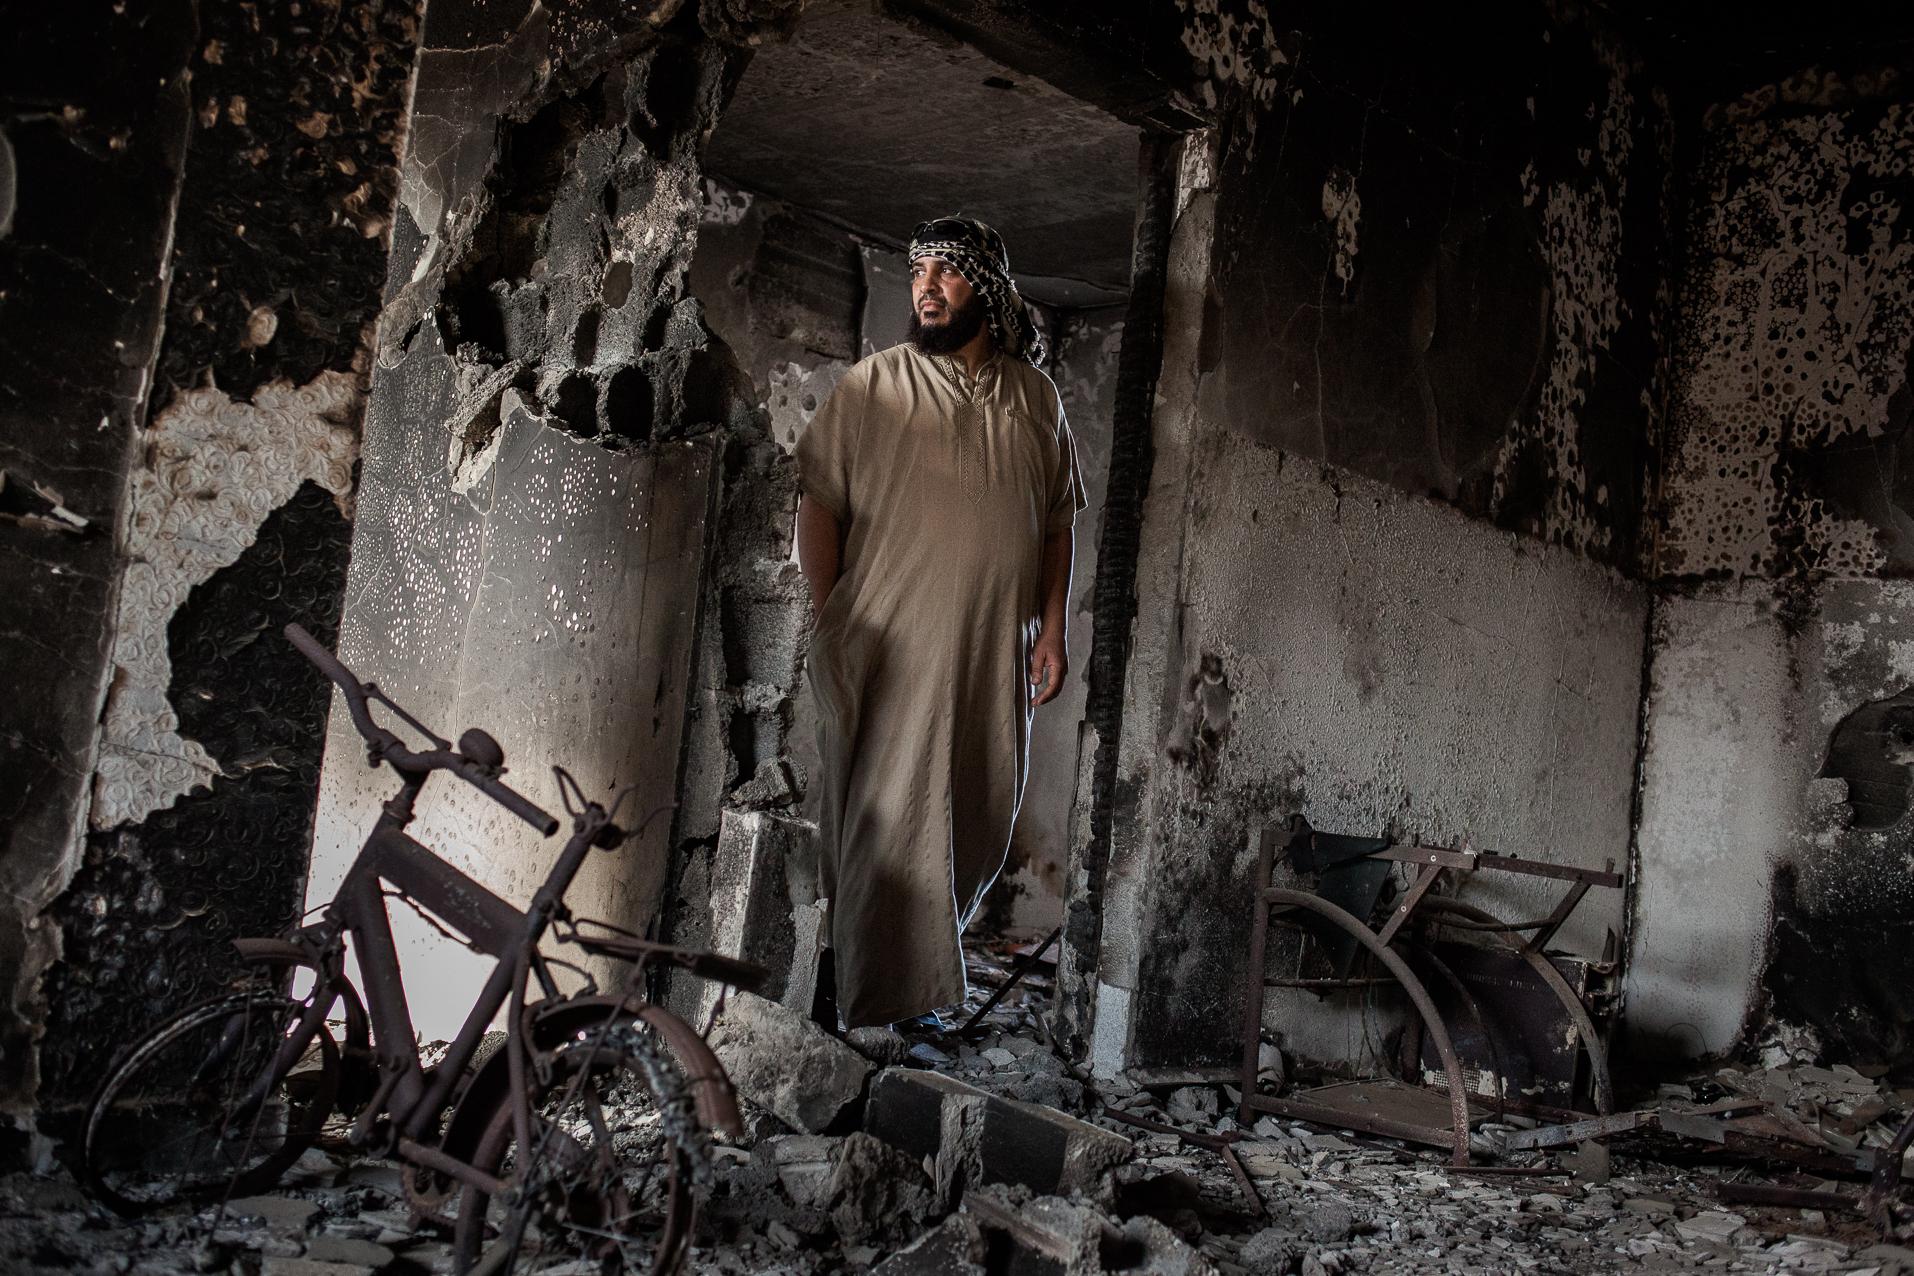 Syrte, Juillet 2012. Walid, dans les décombres de sa maison. Syrte est la ville du pays qui a subi le plus de dommages lors du conflit lybien.  Sirte in July 2012. Walid, in the ruins of his house. Sirte is the town of country that has suffered the most damage during the  Libyan conflict.